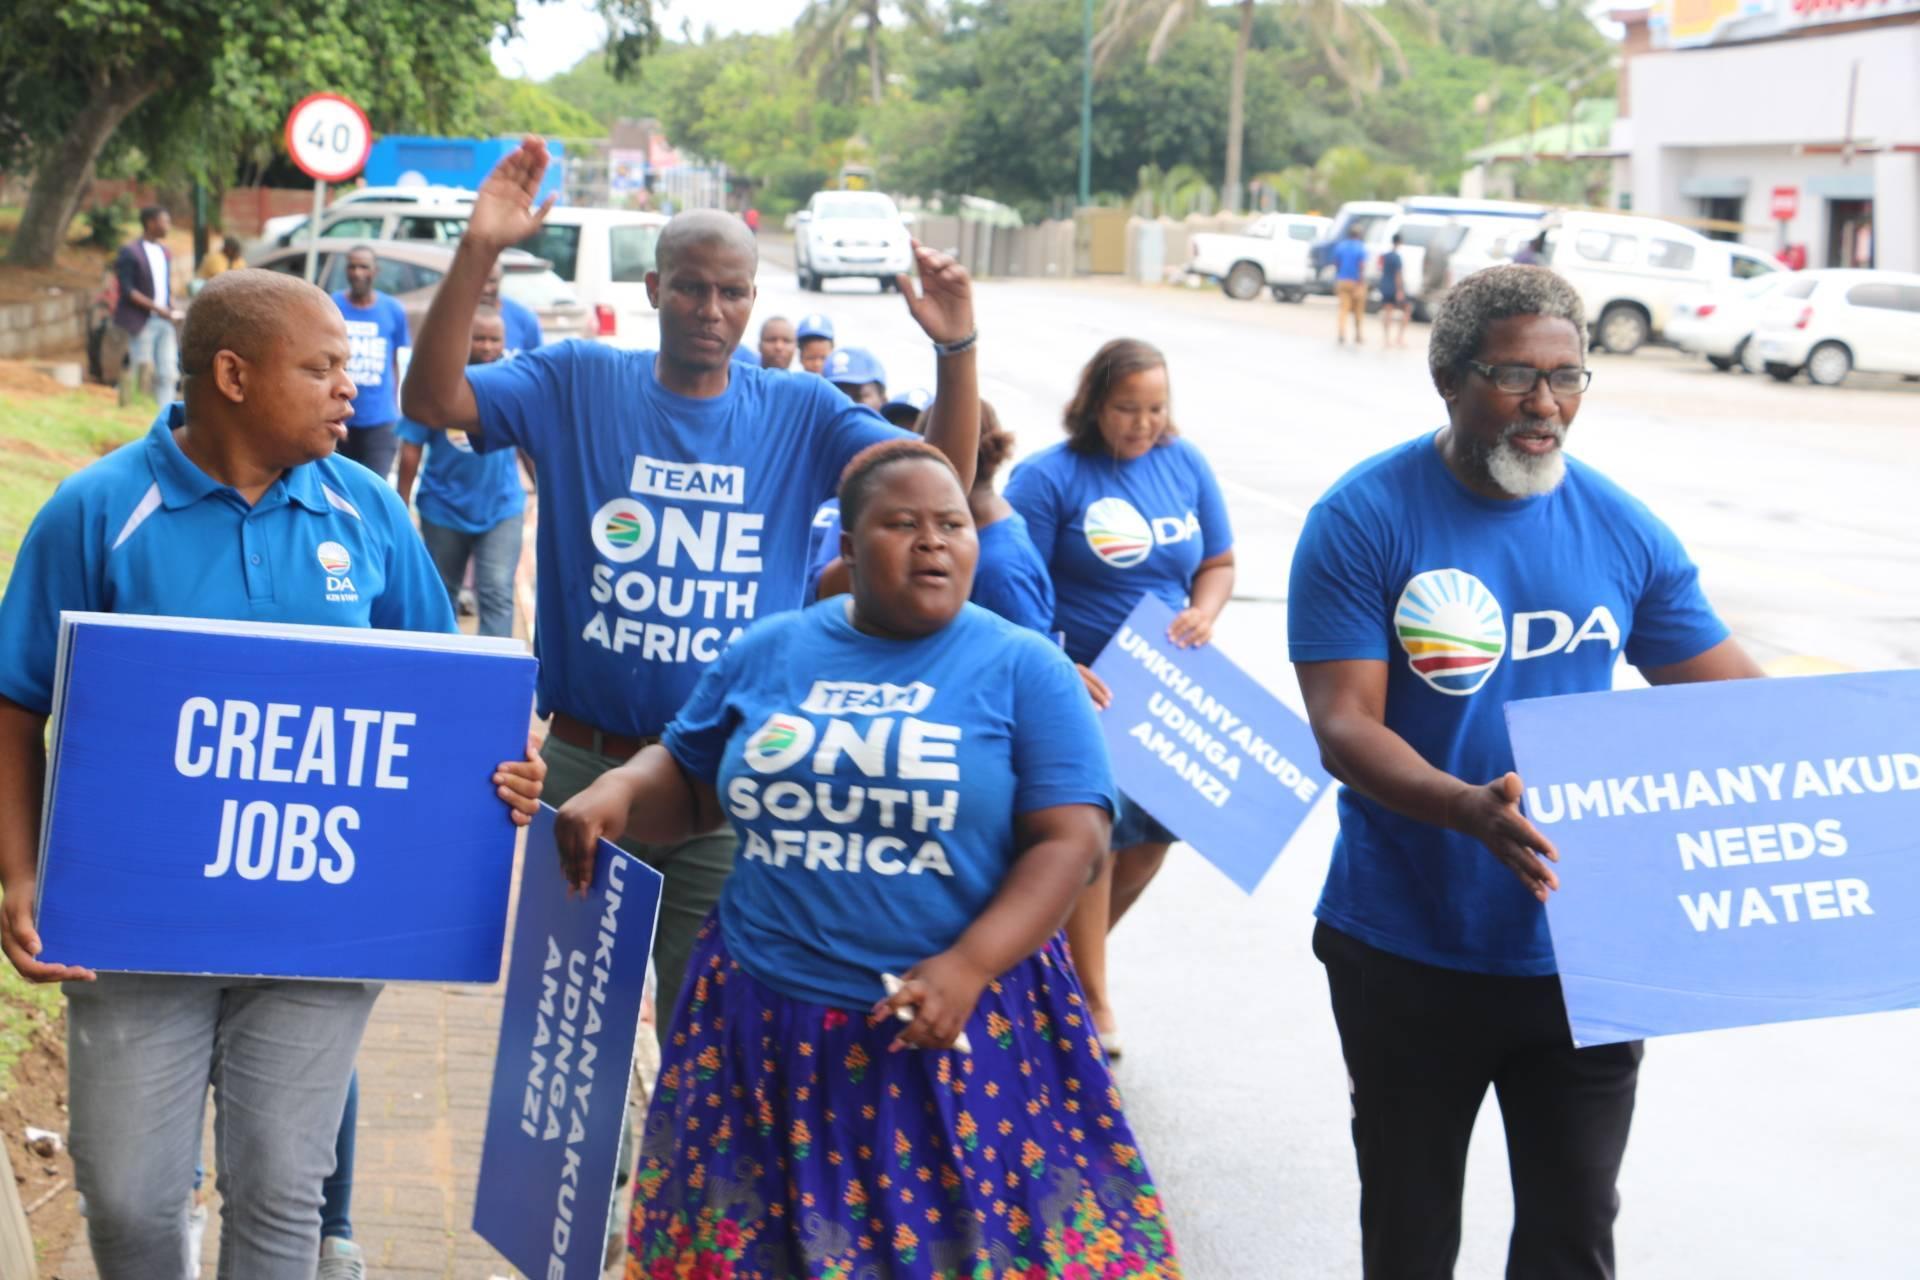 DA calls for uMkhanyakude District to be dissolved